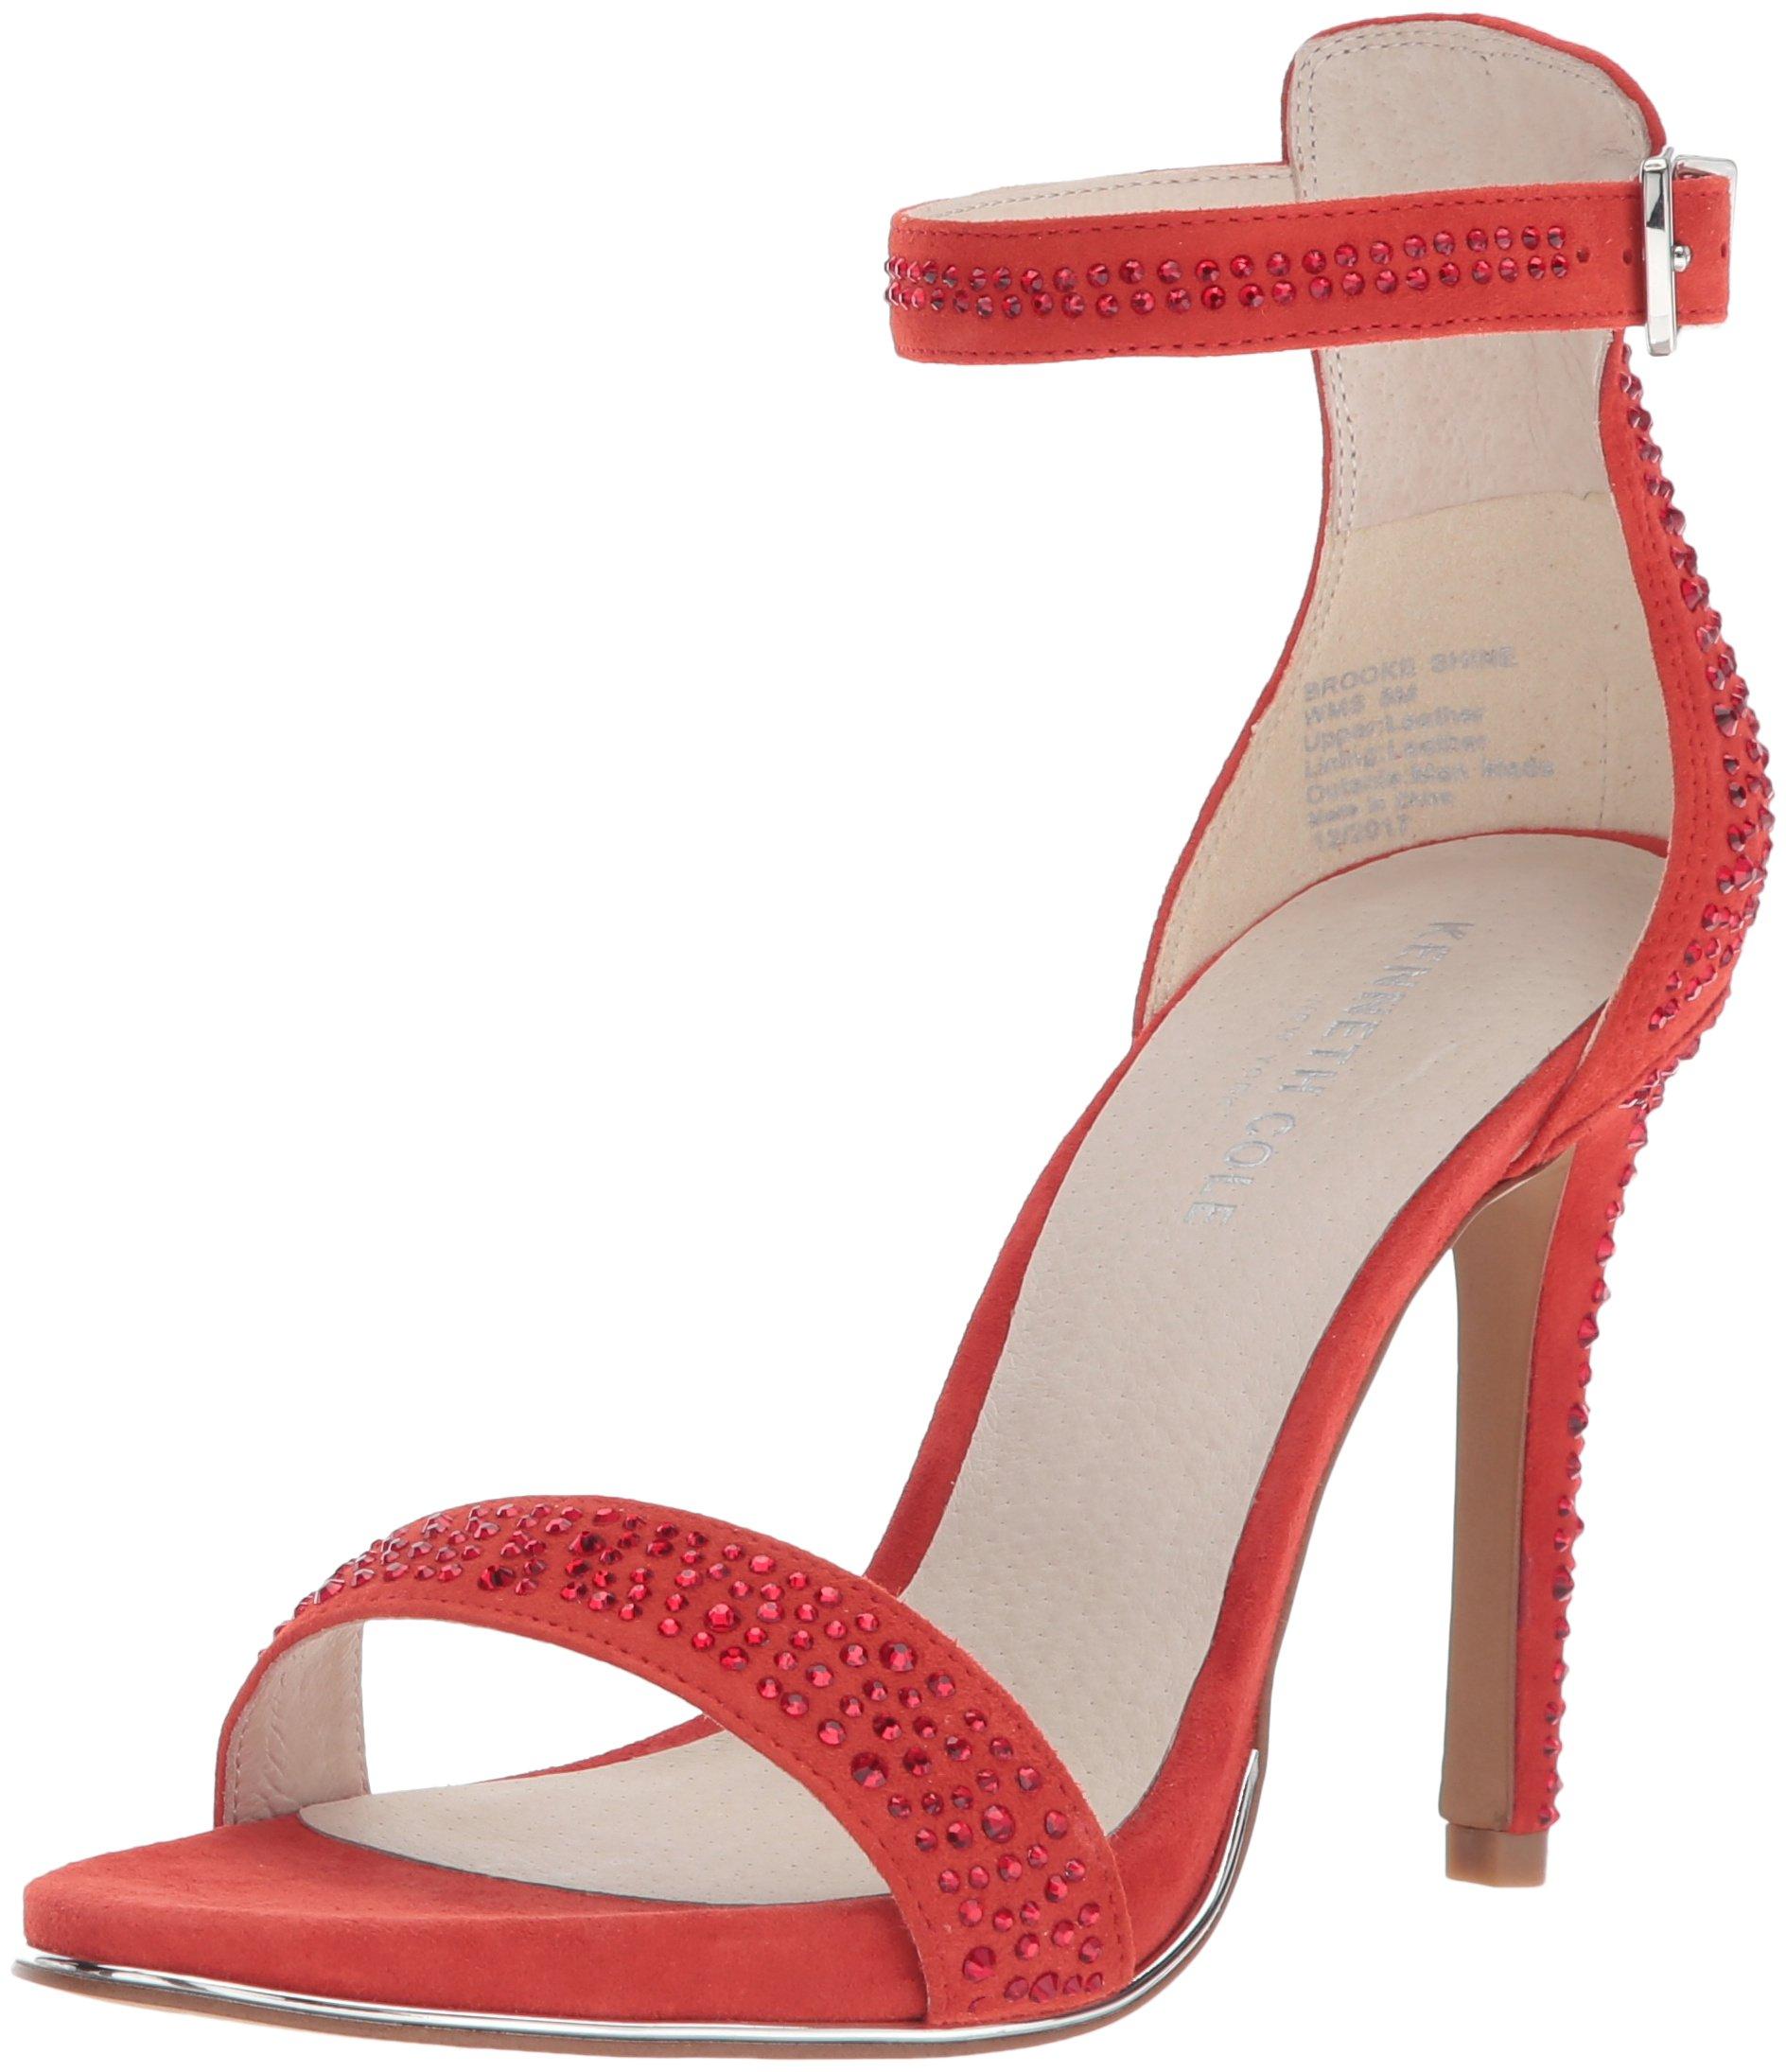 Kenneth Cole New York Womens Brooke Dress Sandal